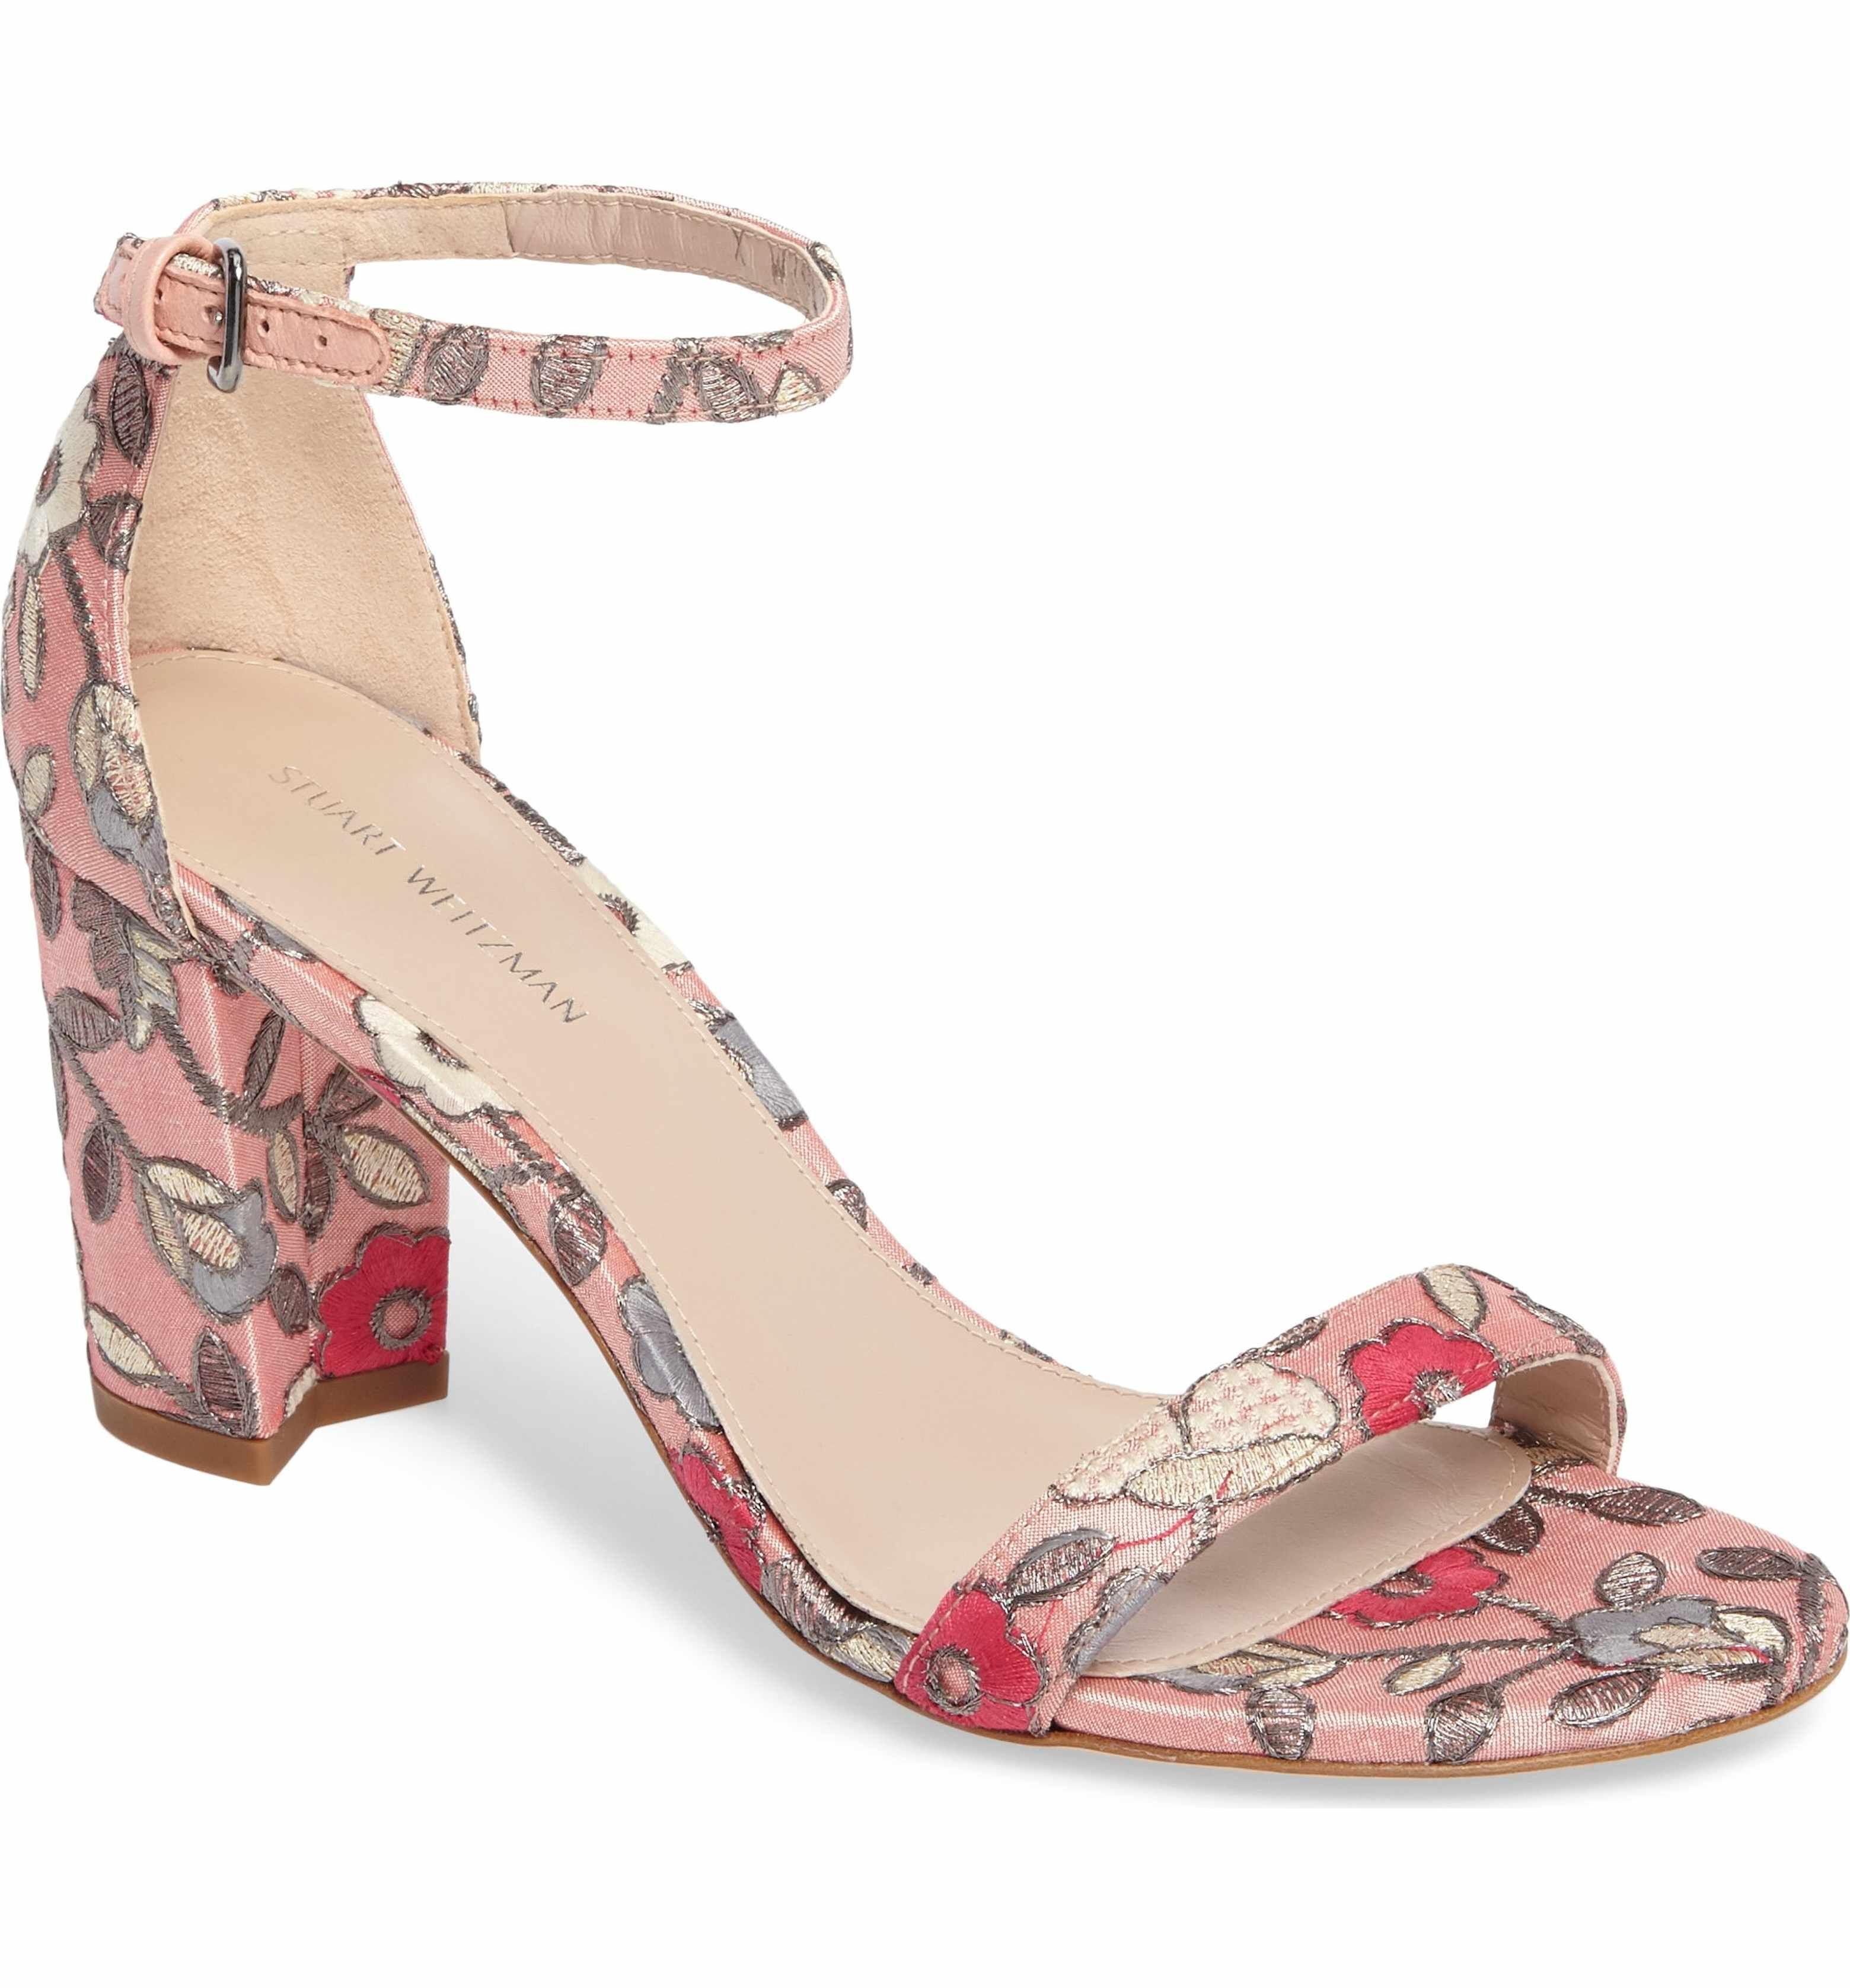 b7e425f3357 Main Image - Stuart Weitzman NearlyNude Ankle Strap Sandal (Women ...